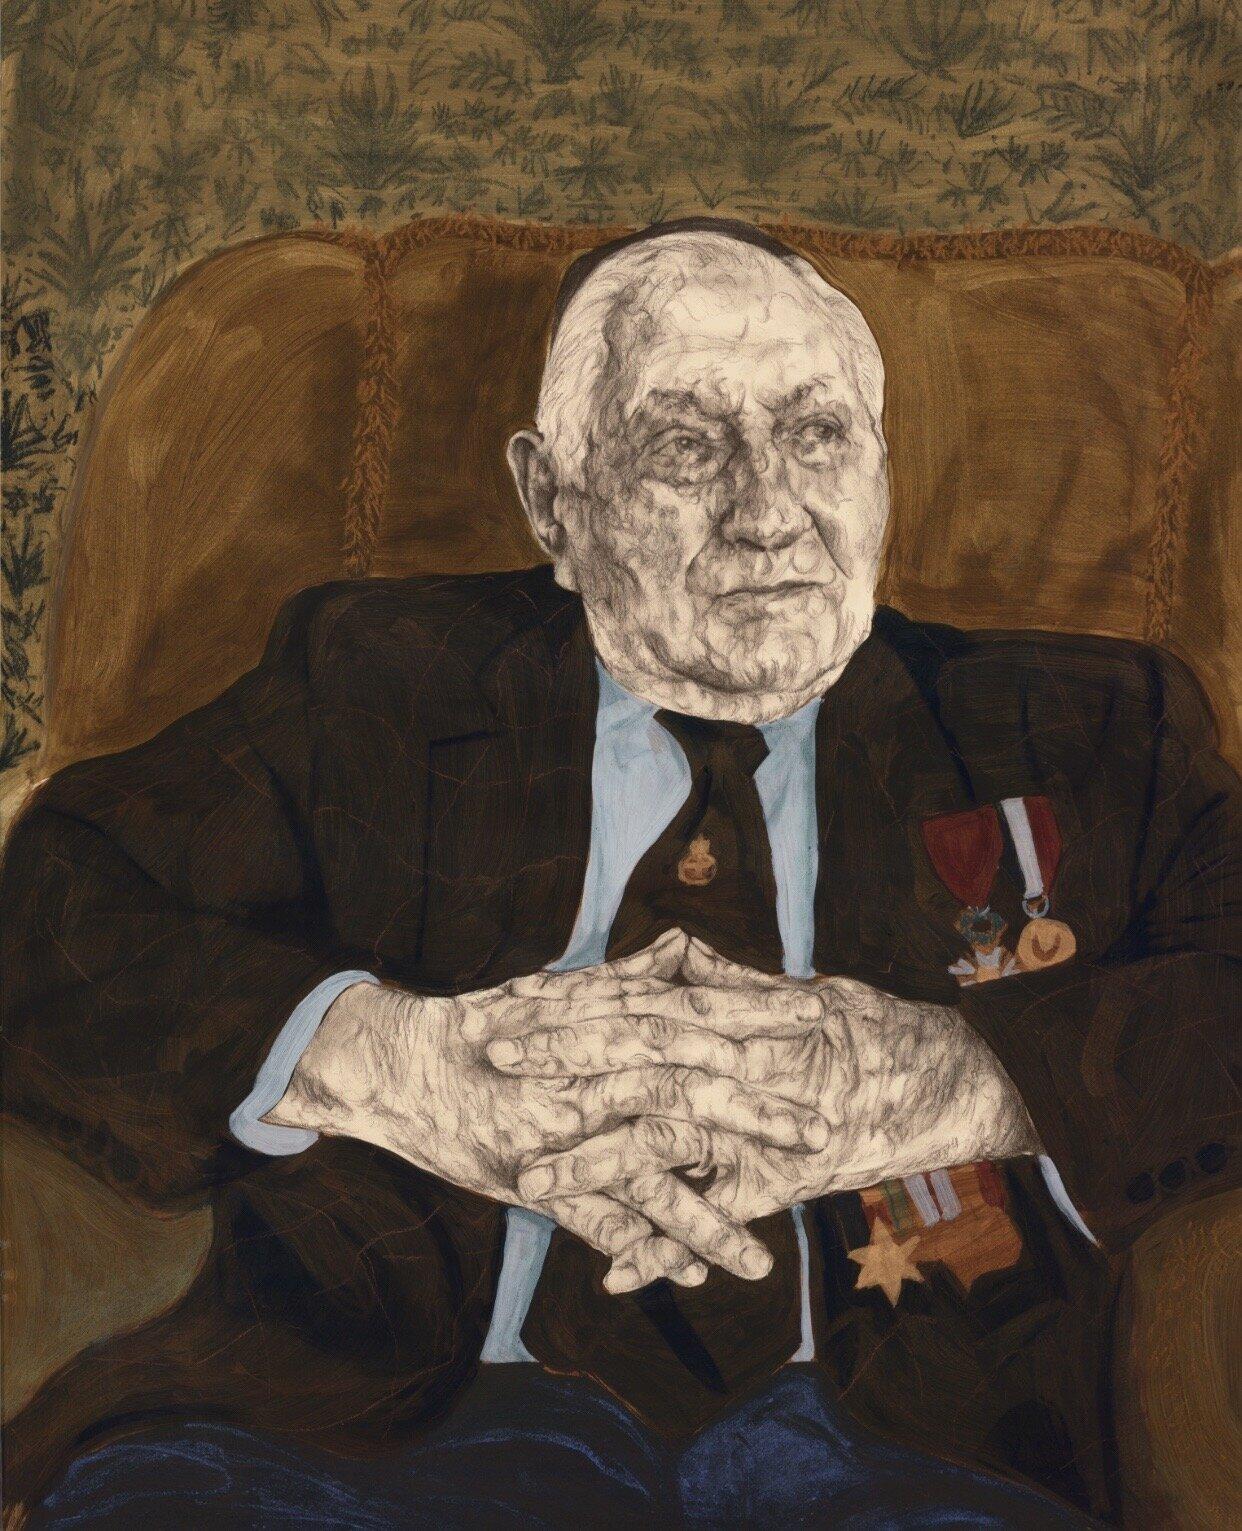 Mervyn Kersh , Sergeant, Royal Army Ordnance Corps.